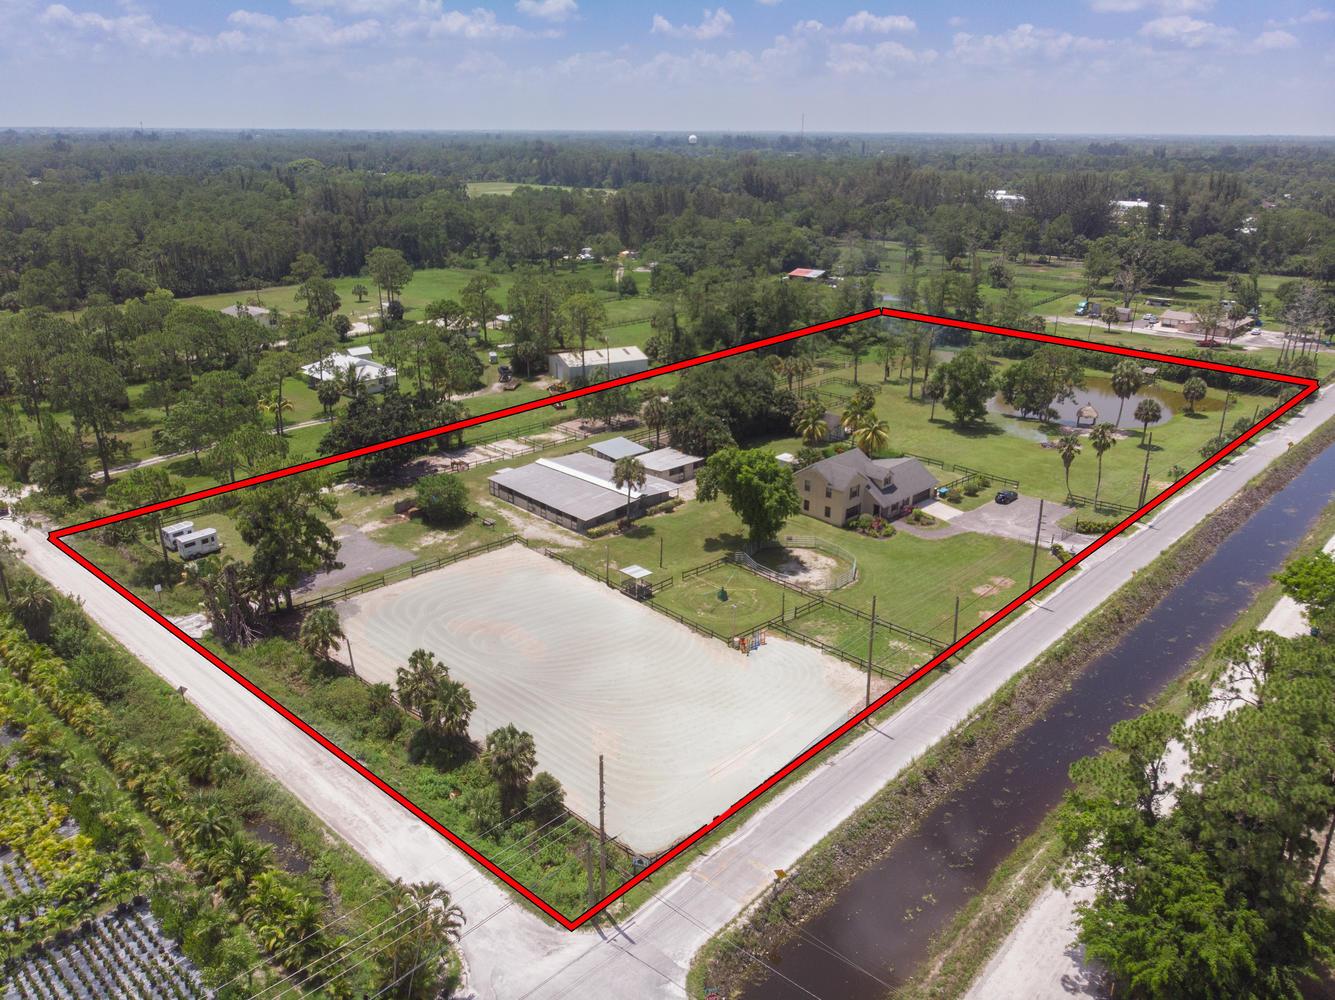 14970 Gruber Lane, Loxahatchee, Florida 33470, ,0.1 BathroomBathrooms,Barn,For Rent,Gruber,RX-10568316